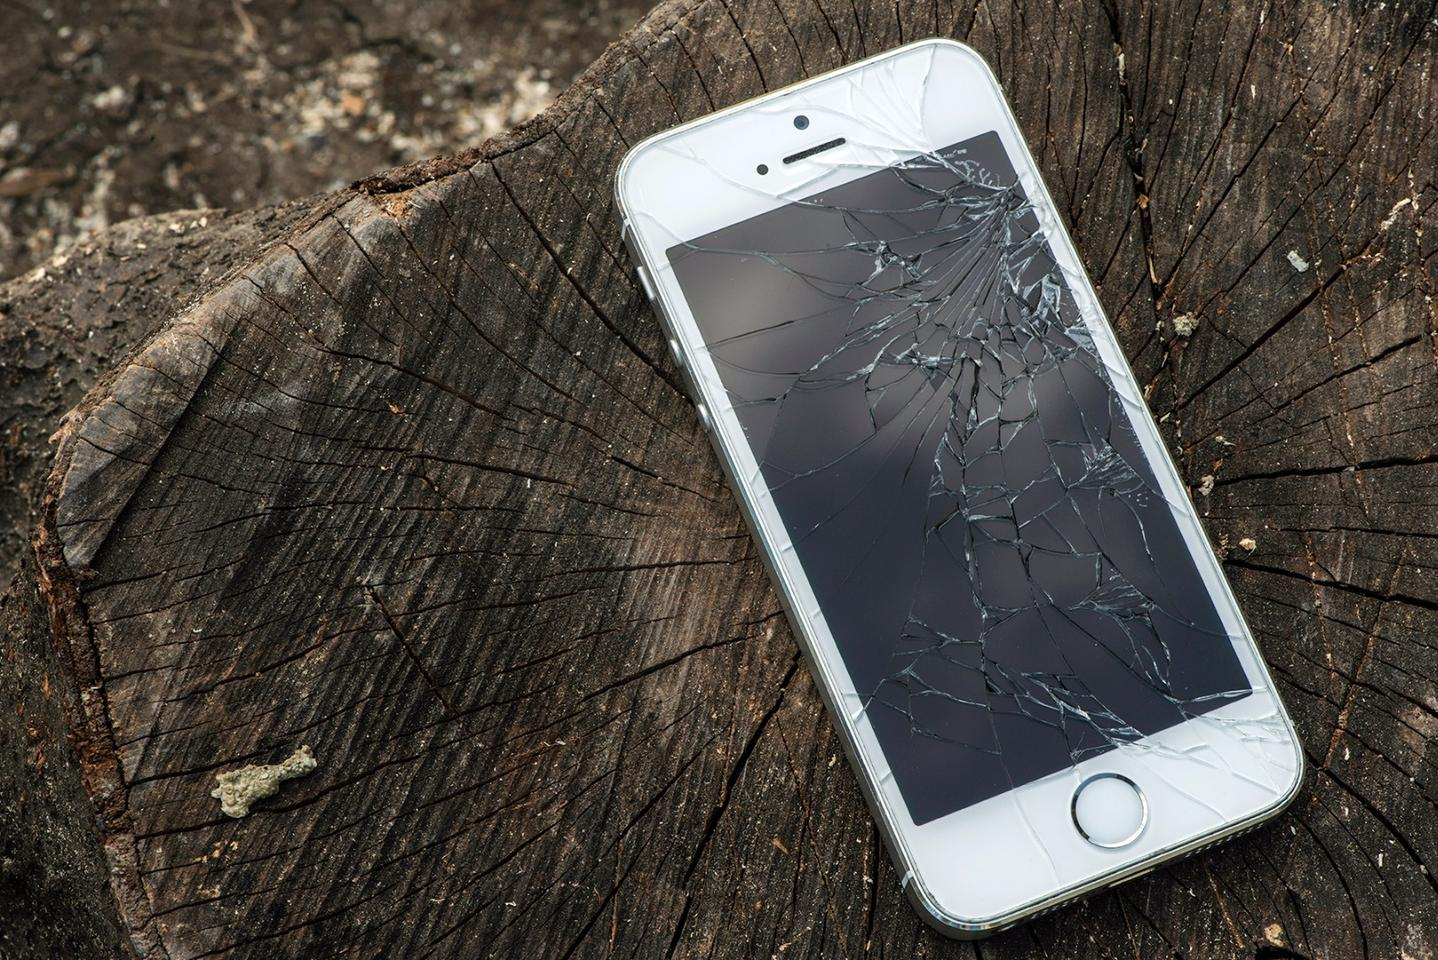 Broken displays are common problem in the smartphone era